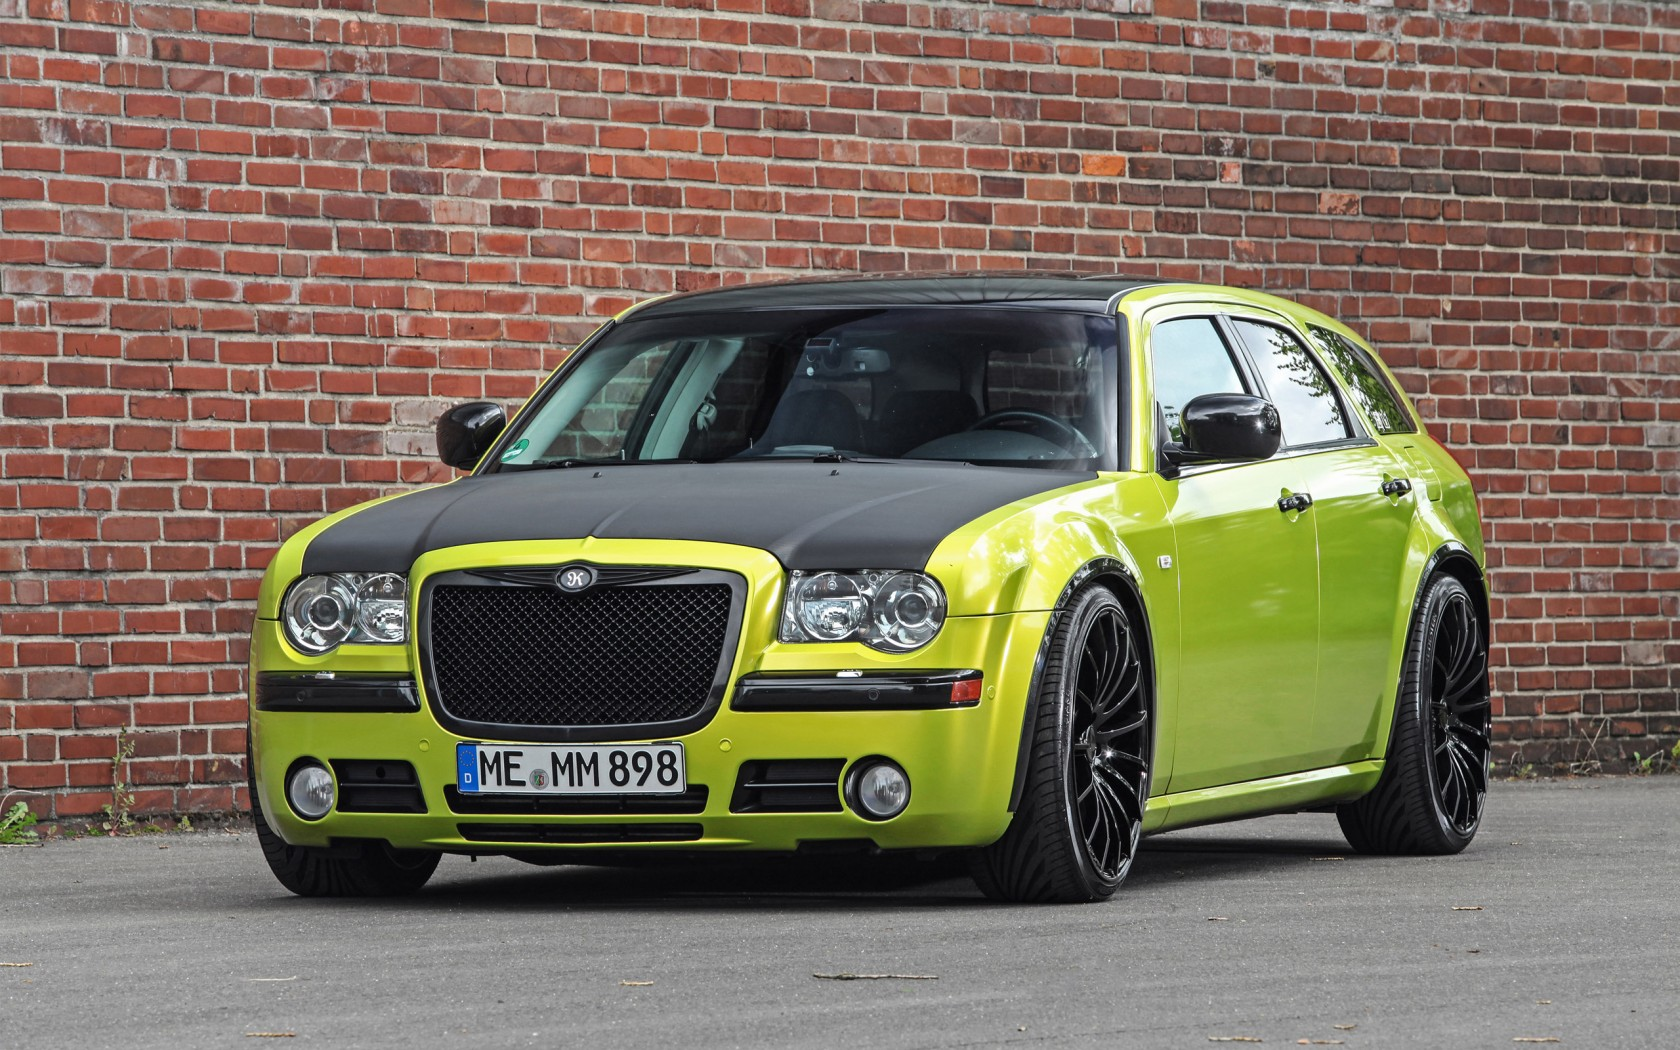 2015 Hplusb Design Chrysler 300C Wallpaper | HD Car ...